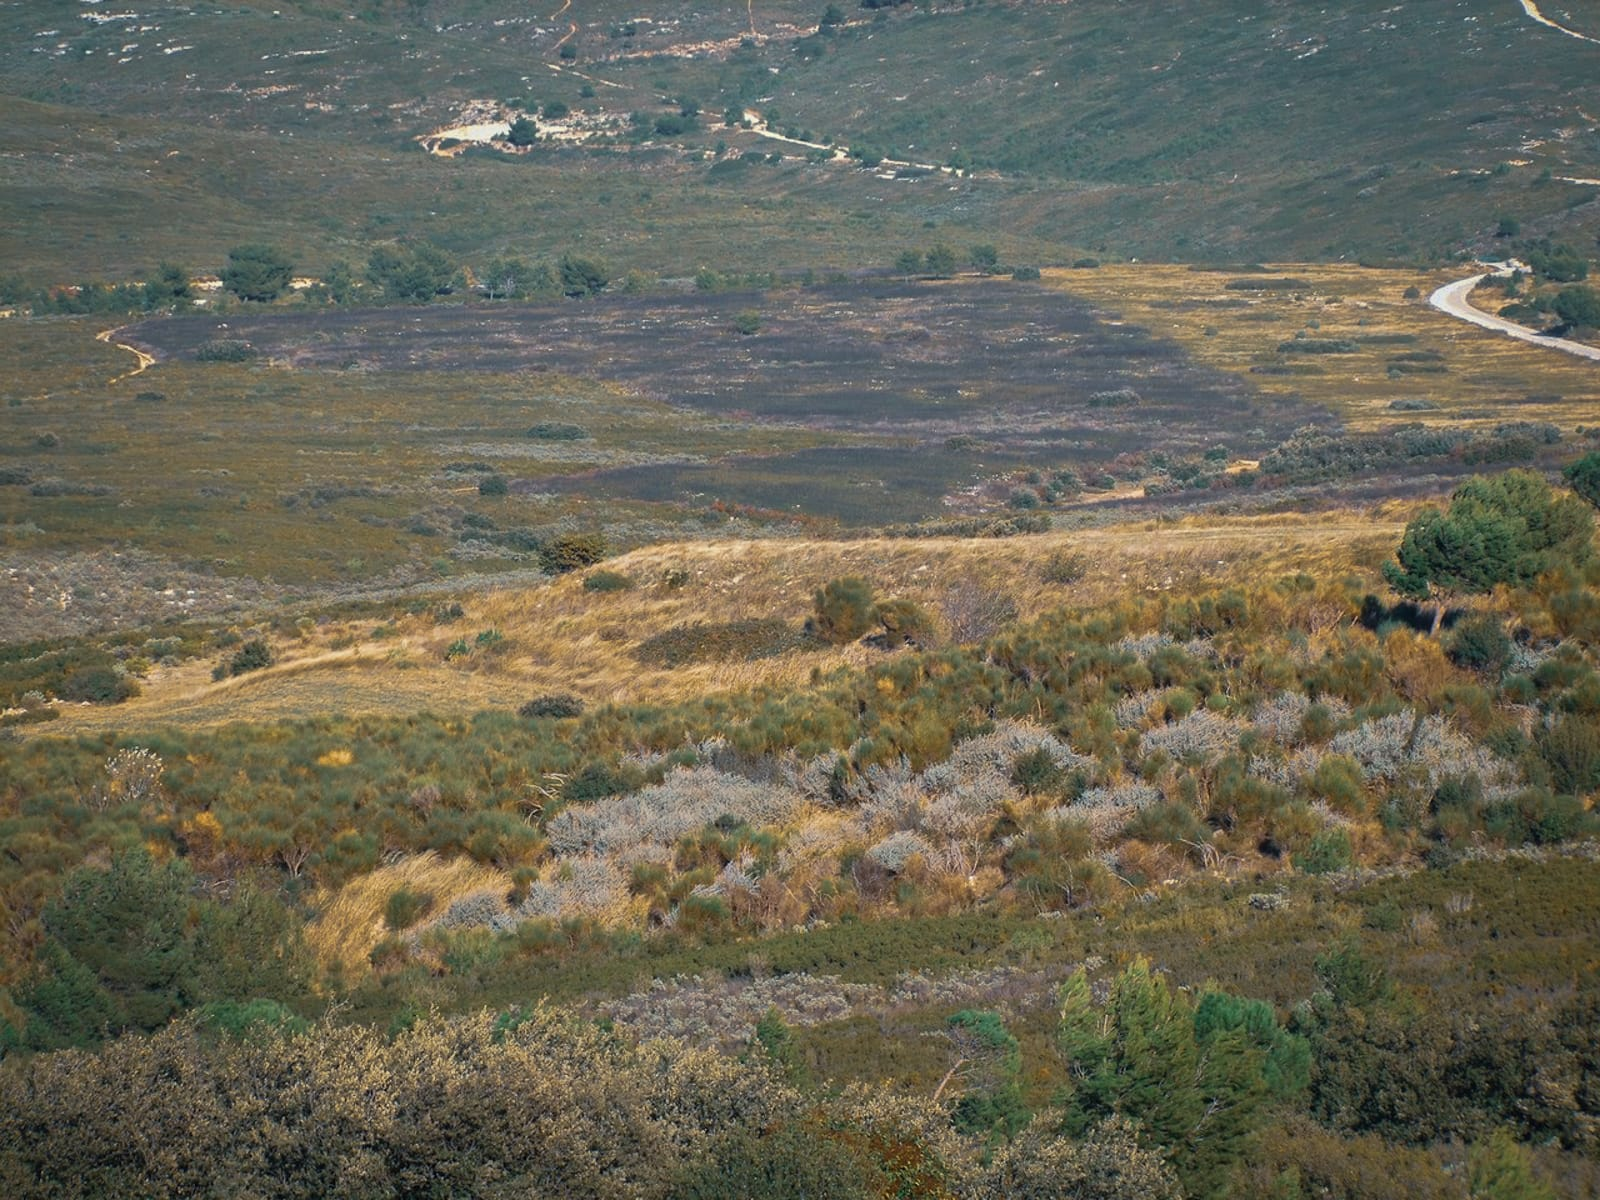 Frange ville nature Marseille Test feu massif etoile®Hermeline Carpentier